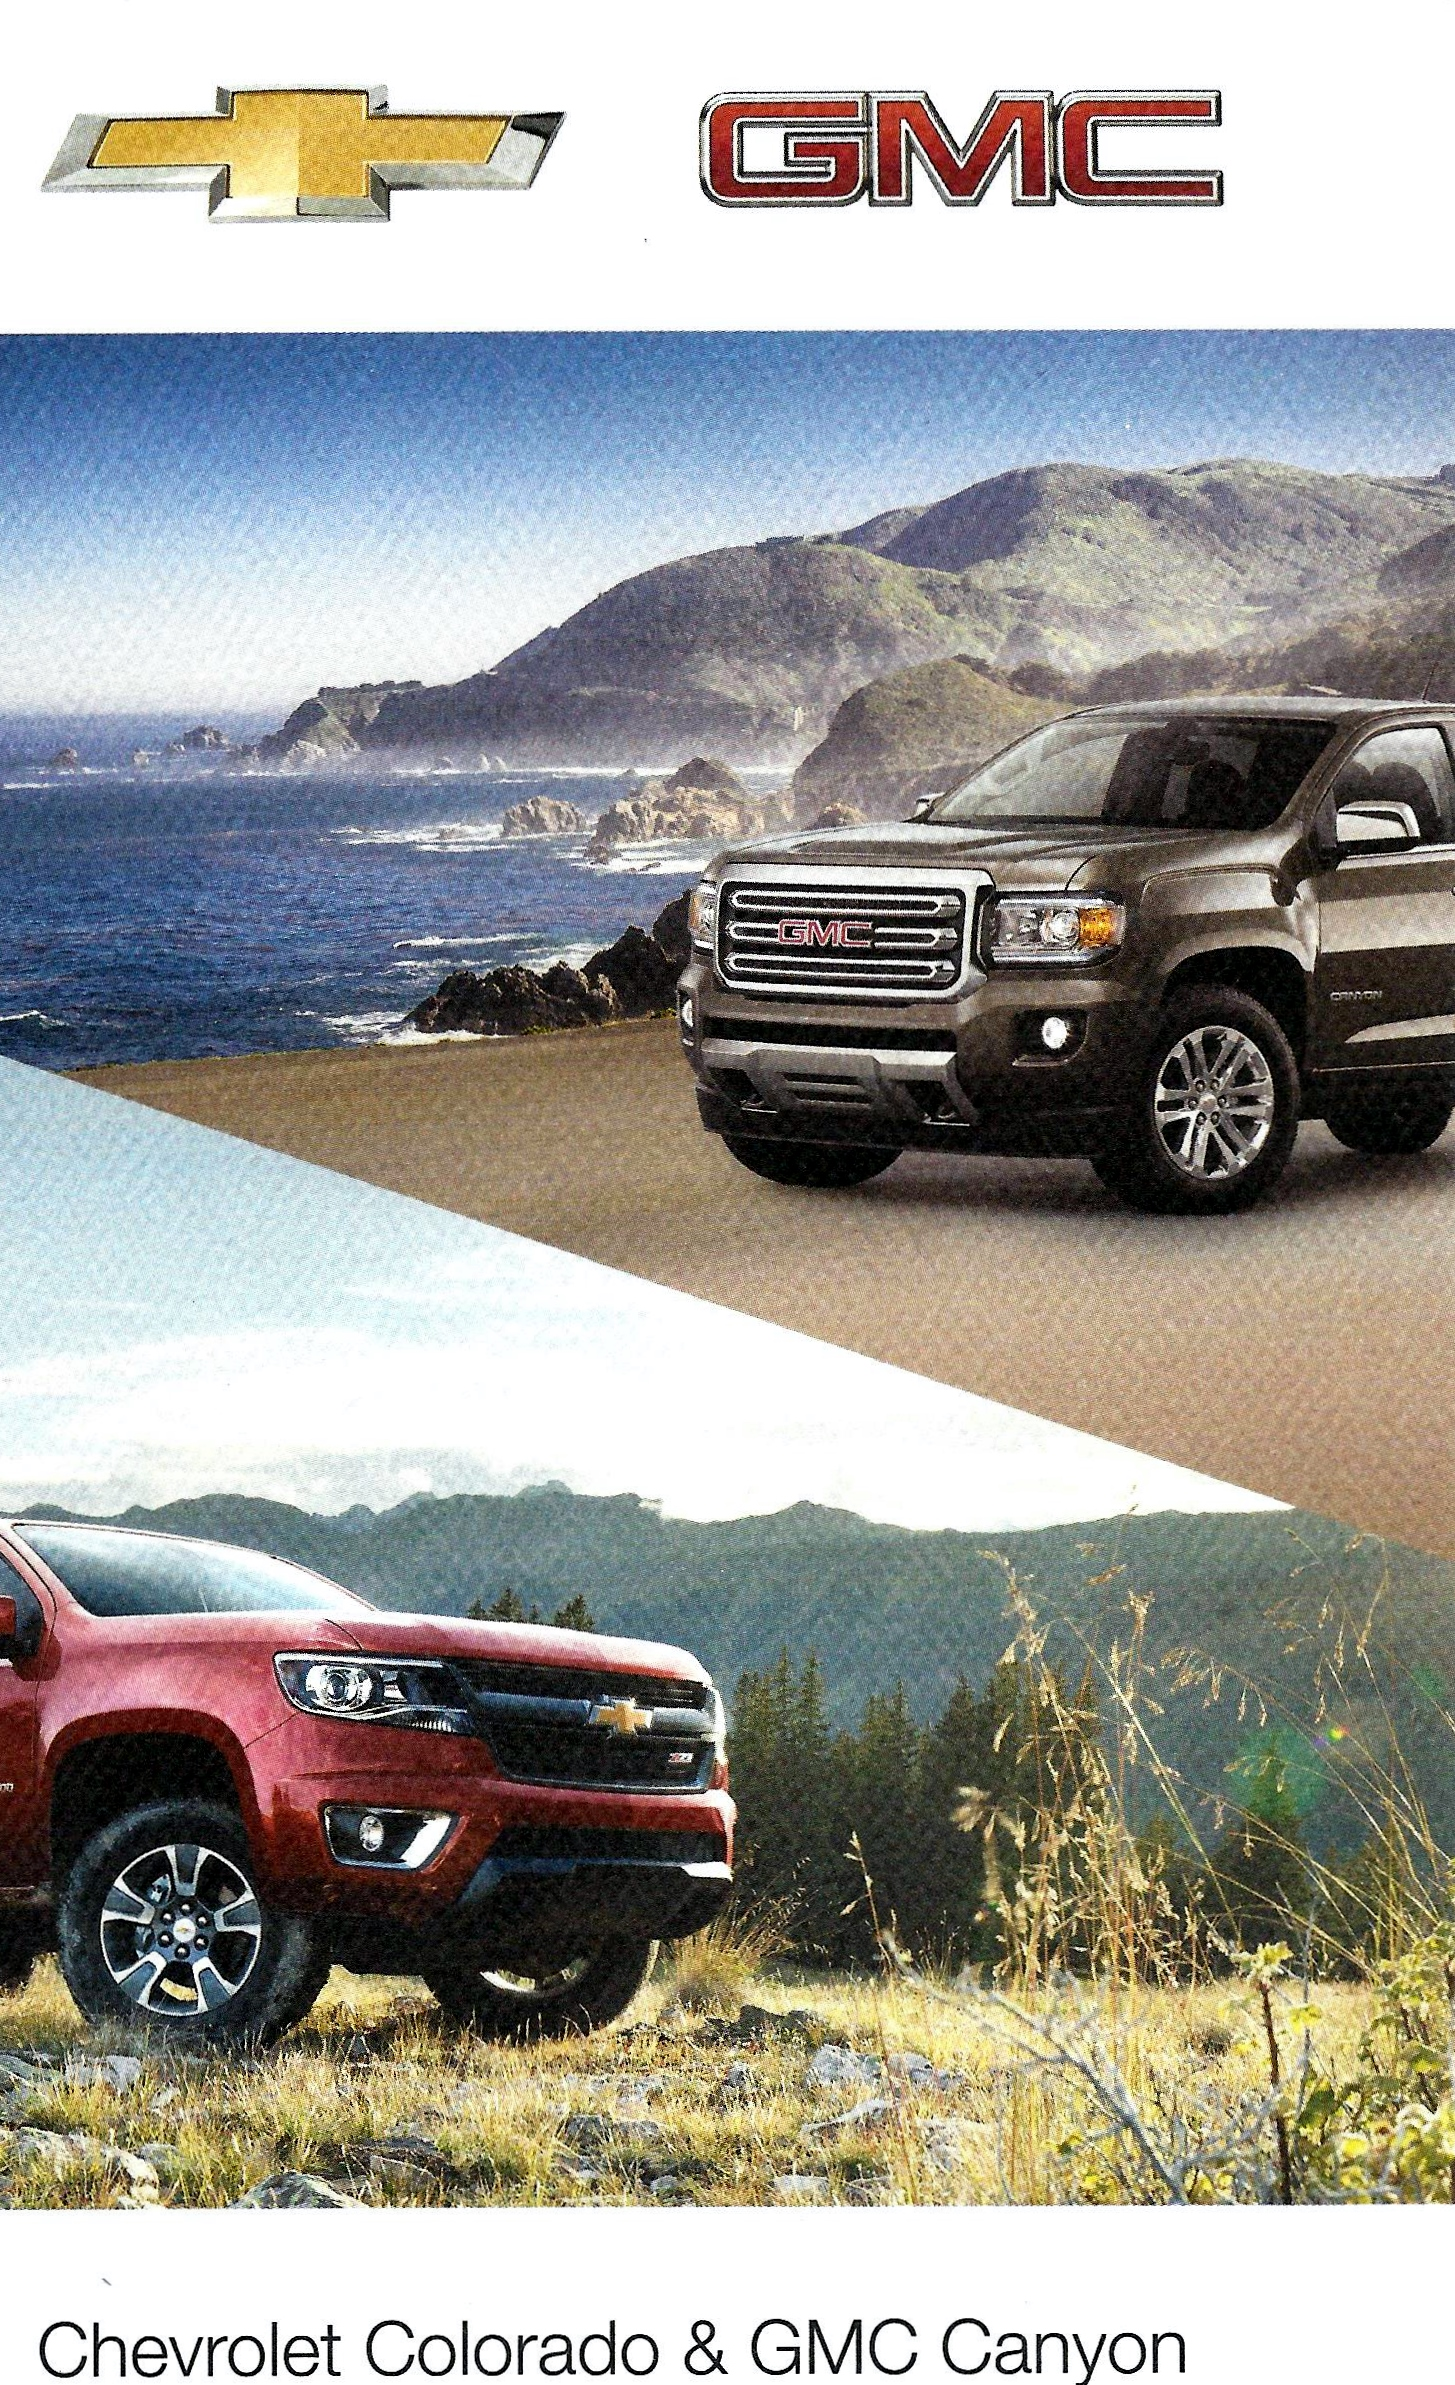 Driven: 2015 Chevrolet Colorado and GMC Canyon Pickups